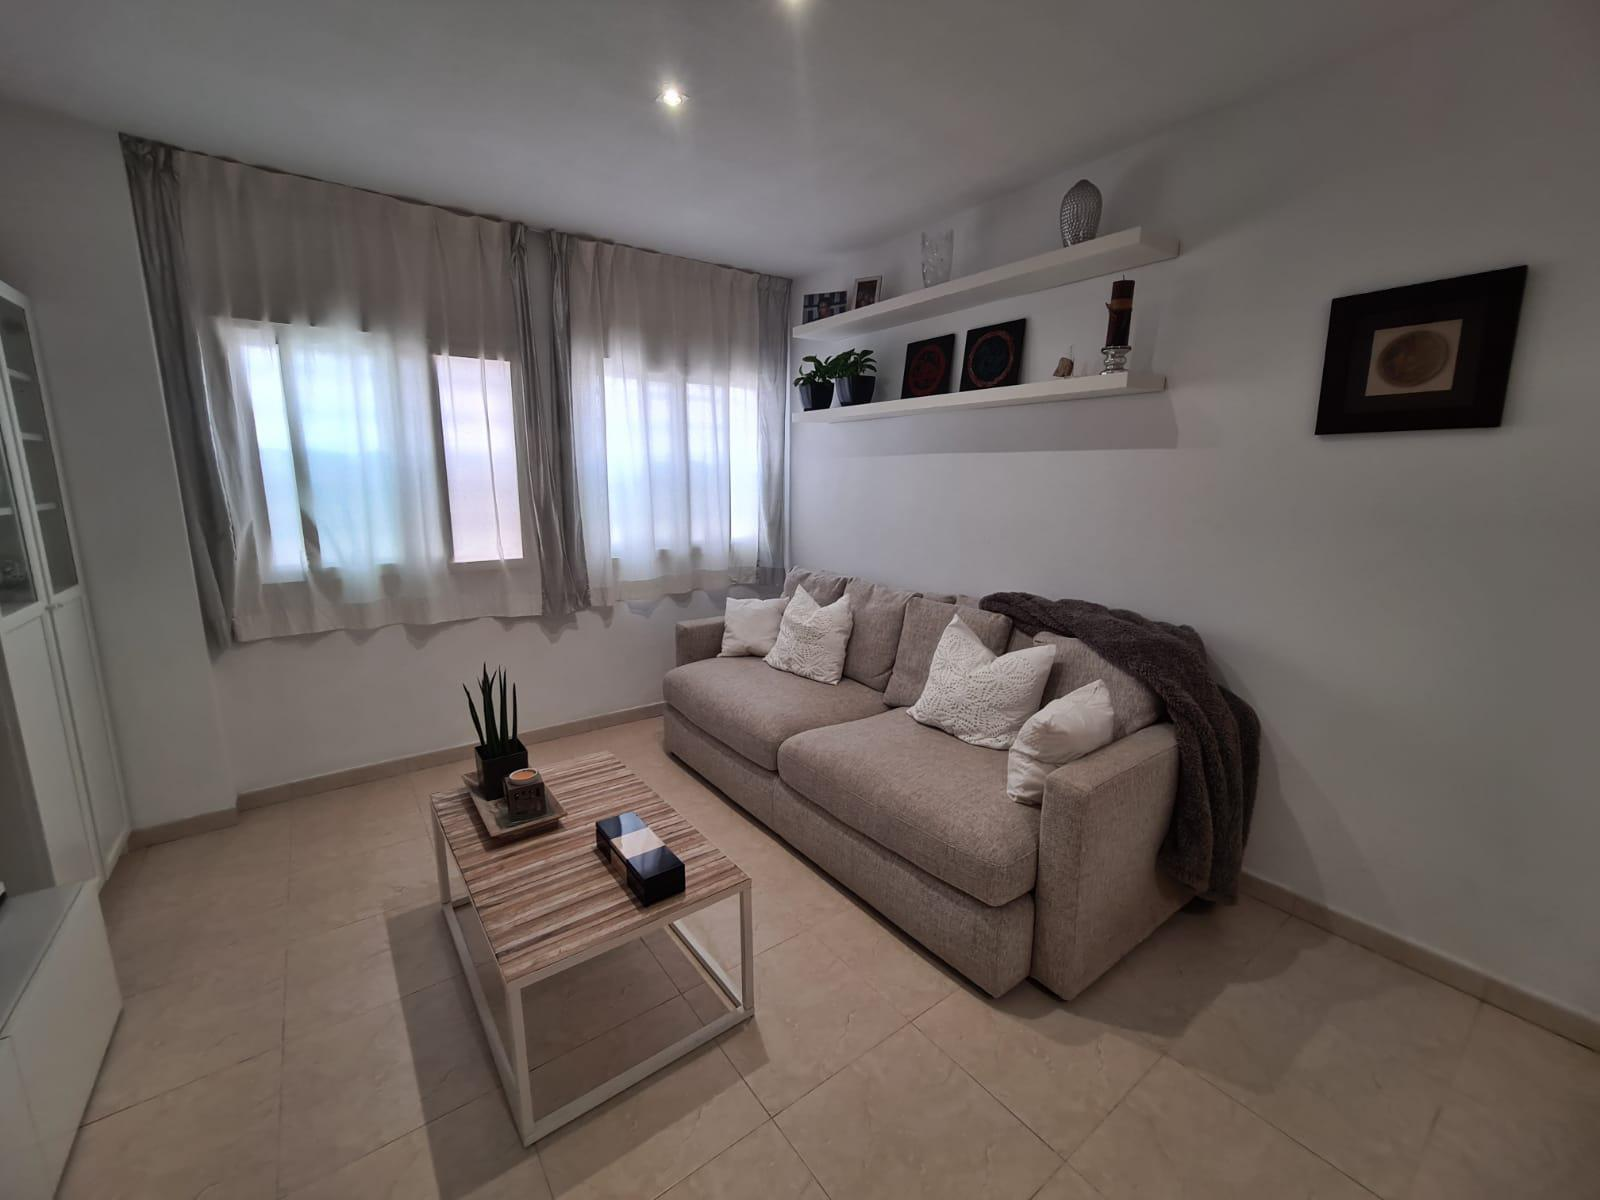 Imagen 4 Planta Baja en venta en Alicante/alacant / Barrio de San Agustín